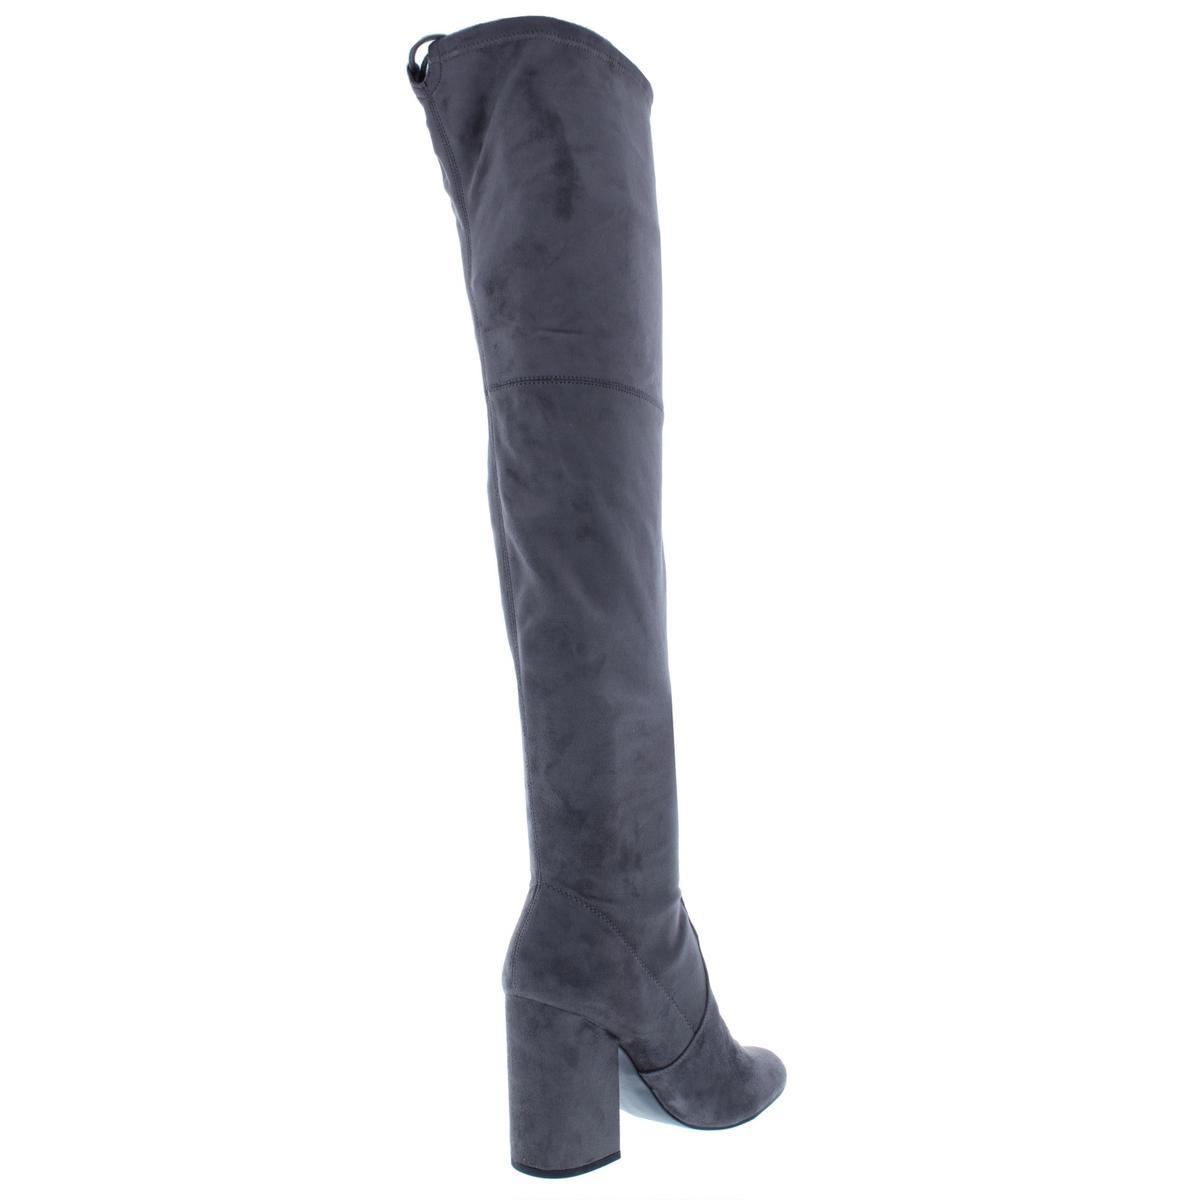 5212b8500e7 Boots Clothing